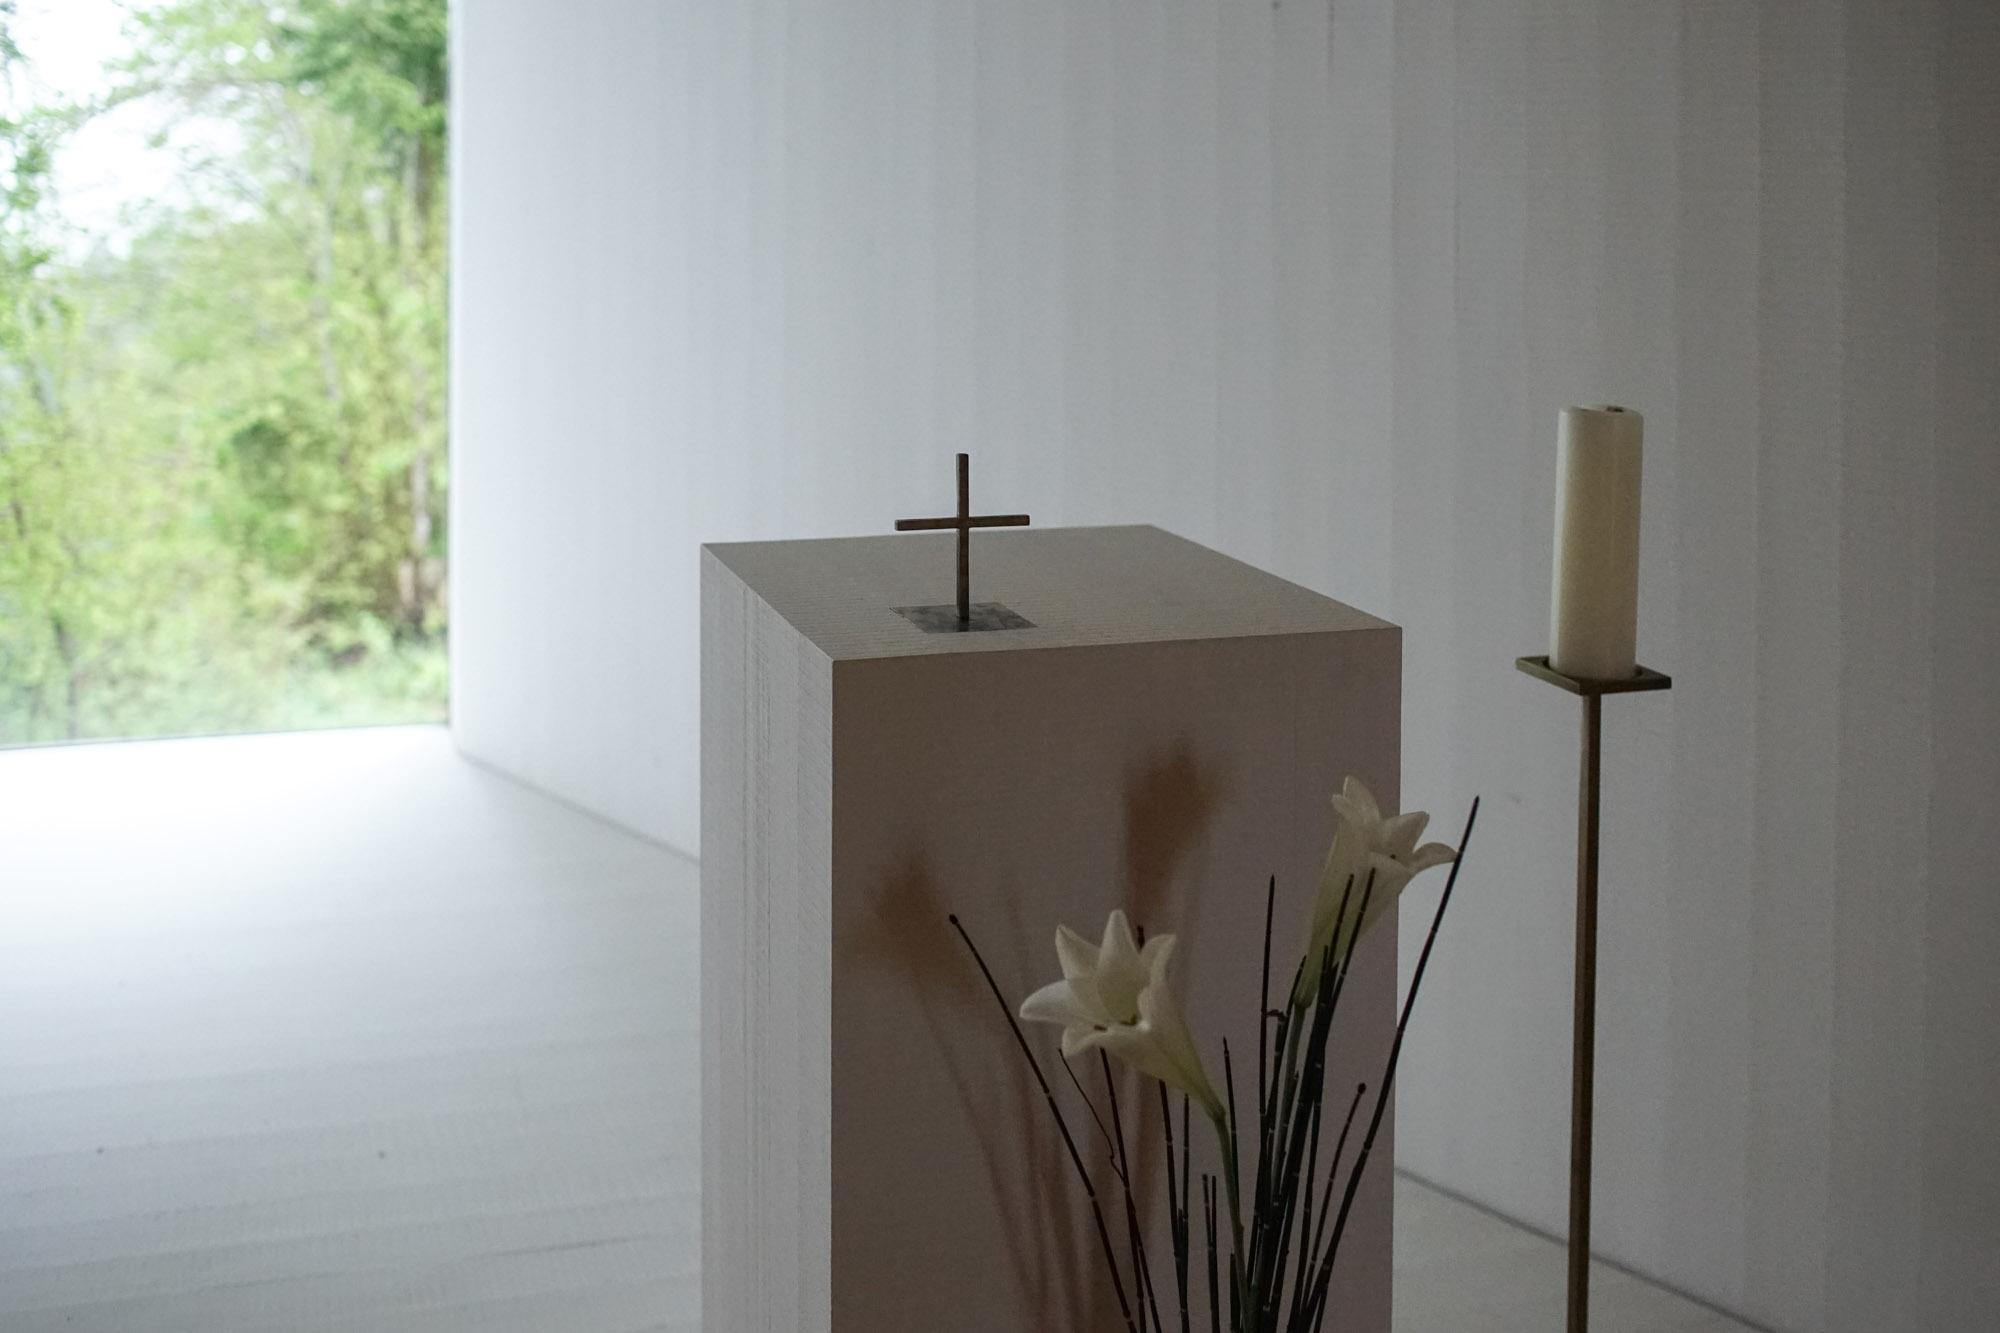 salgenreute-chapel-bernardo-bader-photo-jean-nicolas-lechat-urbantyper-5